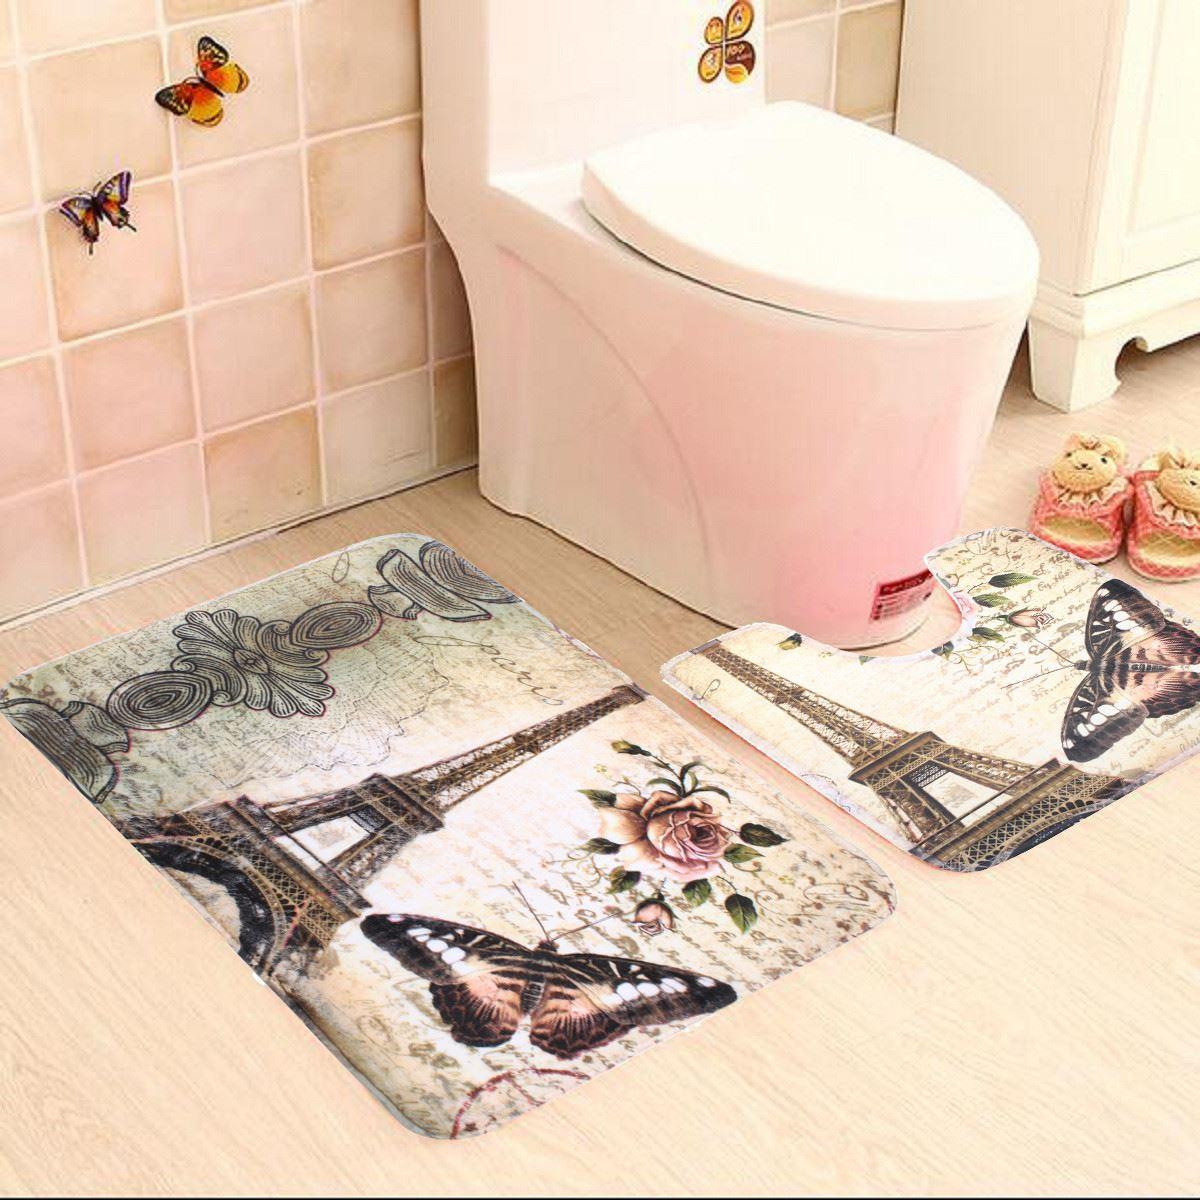 Soft Paris Eiffel Tower Bath Pedestal Rug Cover Bathroom Bath Mat Set Household Bathroom Carpets Design Decor Houseware 2pcs